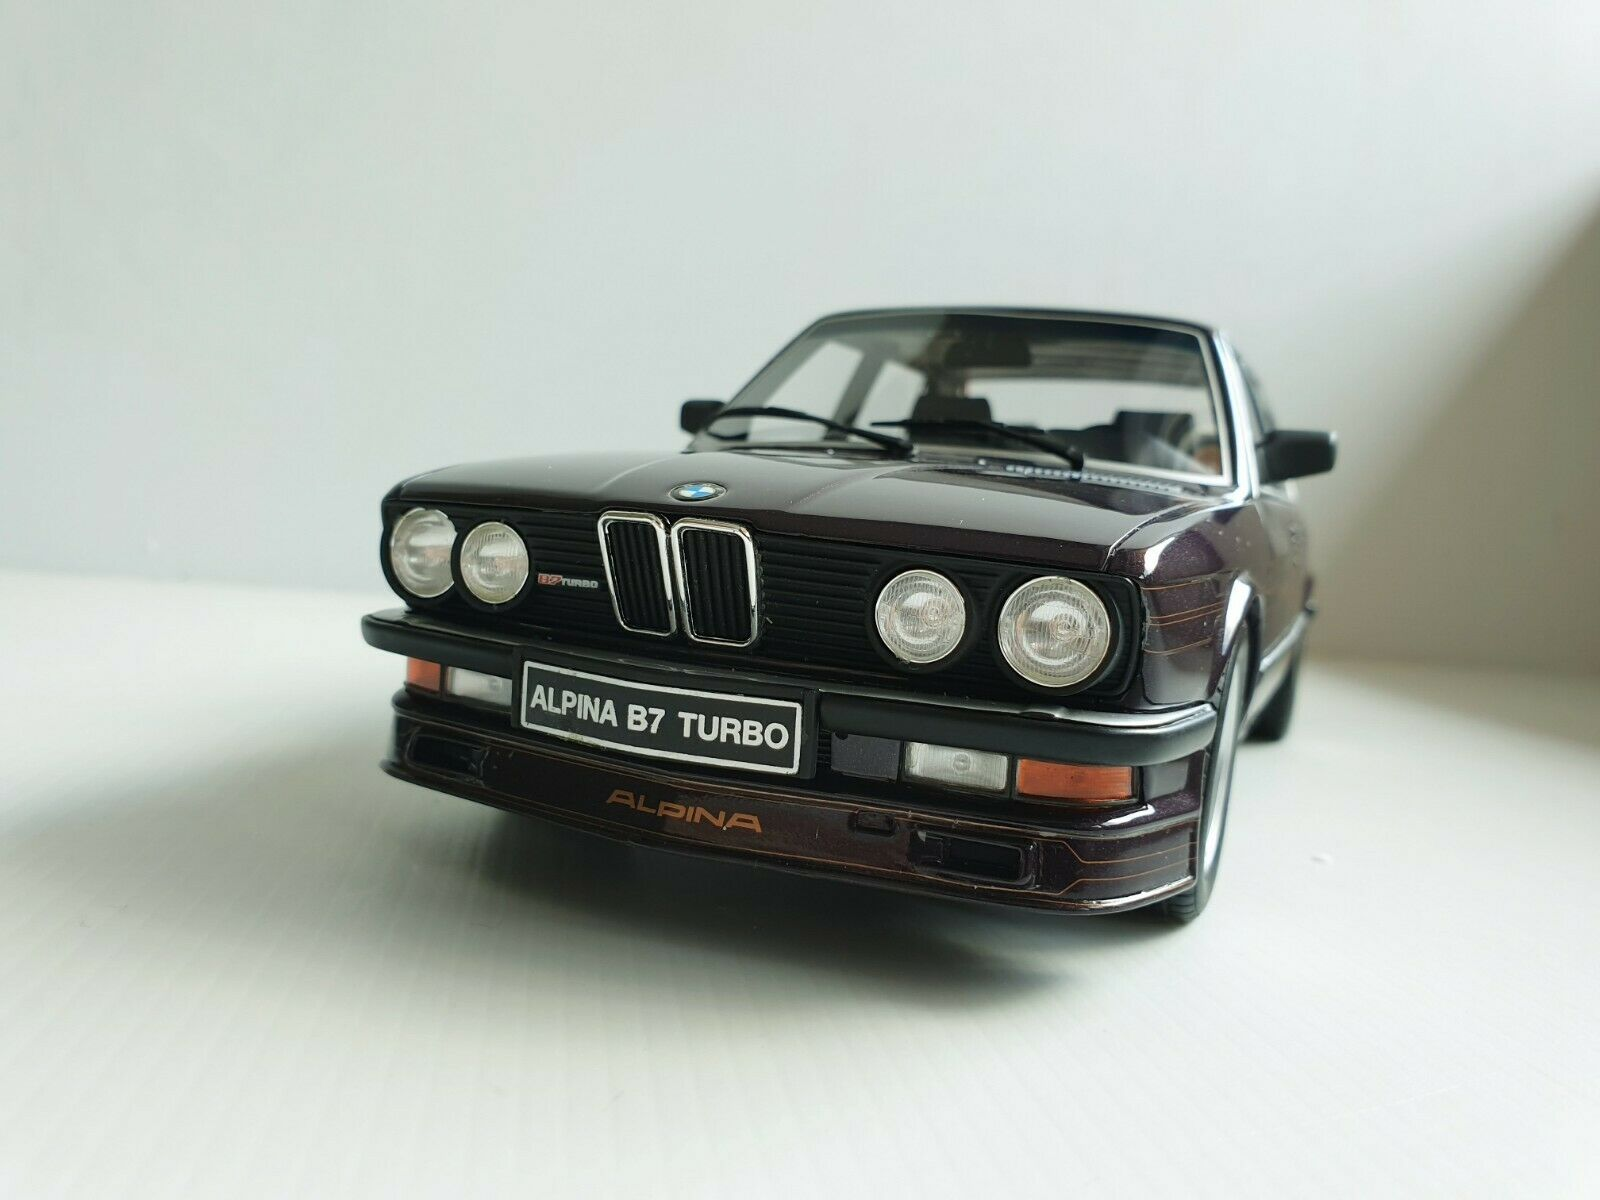 punto de venta de la marca BMW Alpina B7 S E12 Turbo 1 18 Otto mobile mobile mobile OT152 púrpurat  calidad oficial